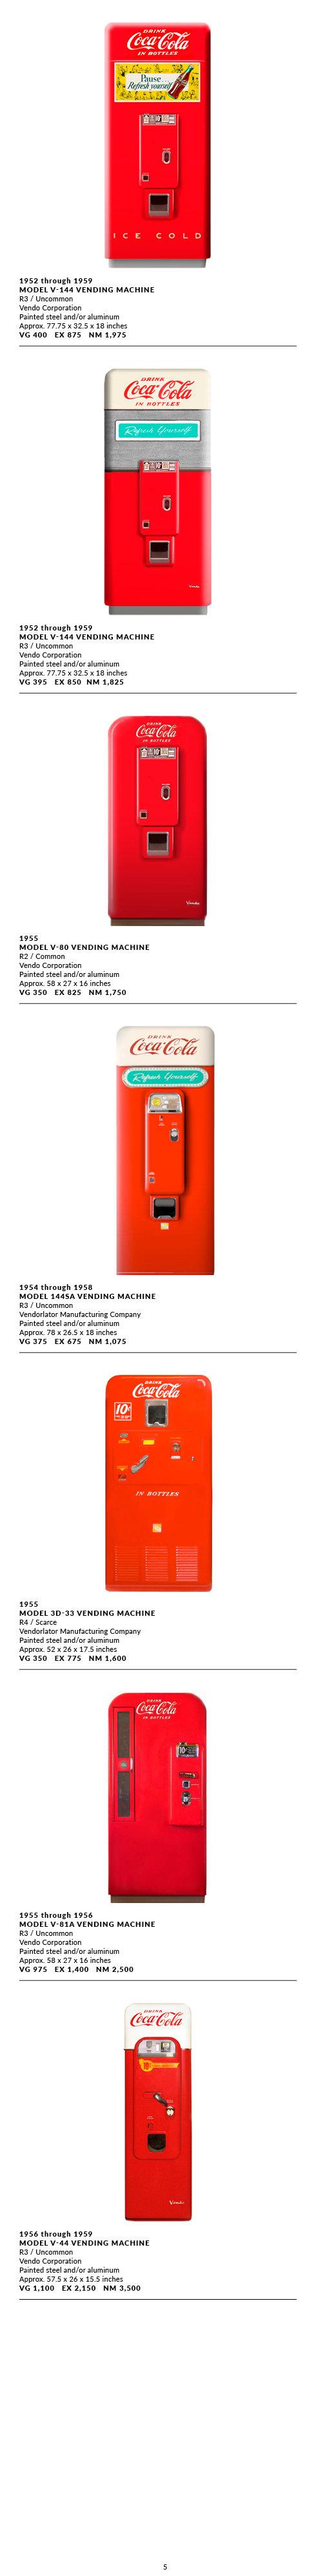 Vending Machines5.jpg